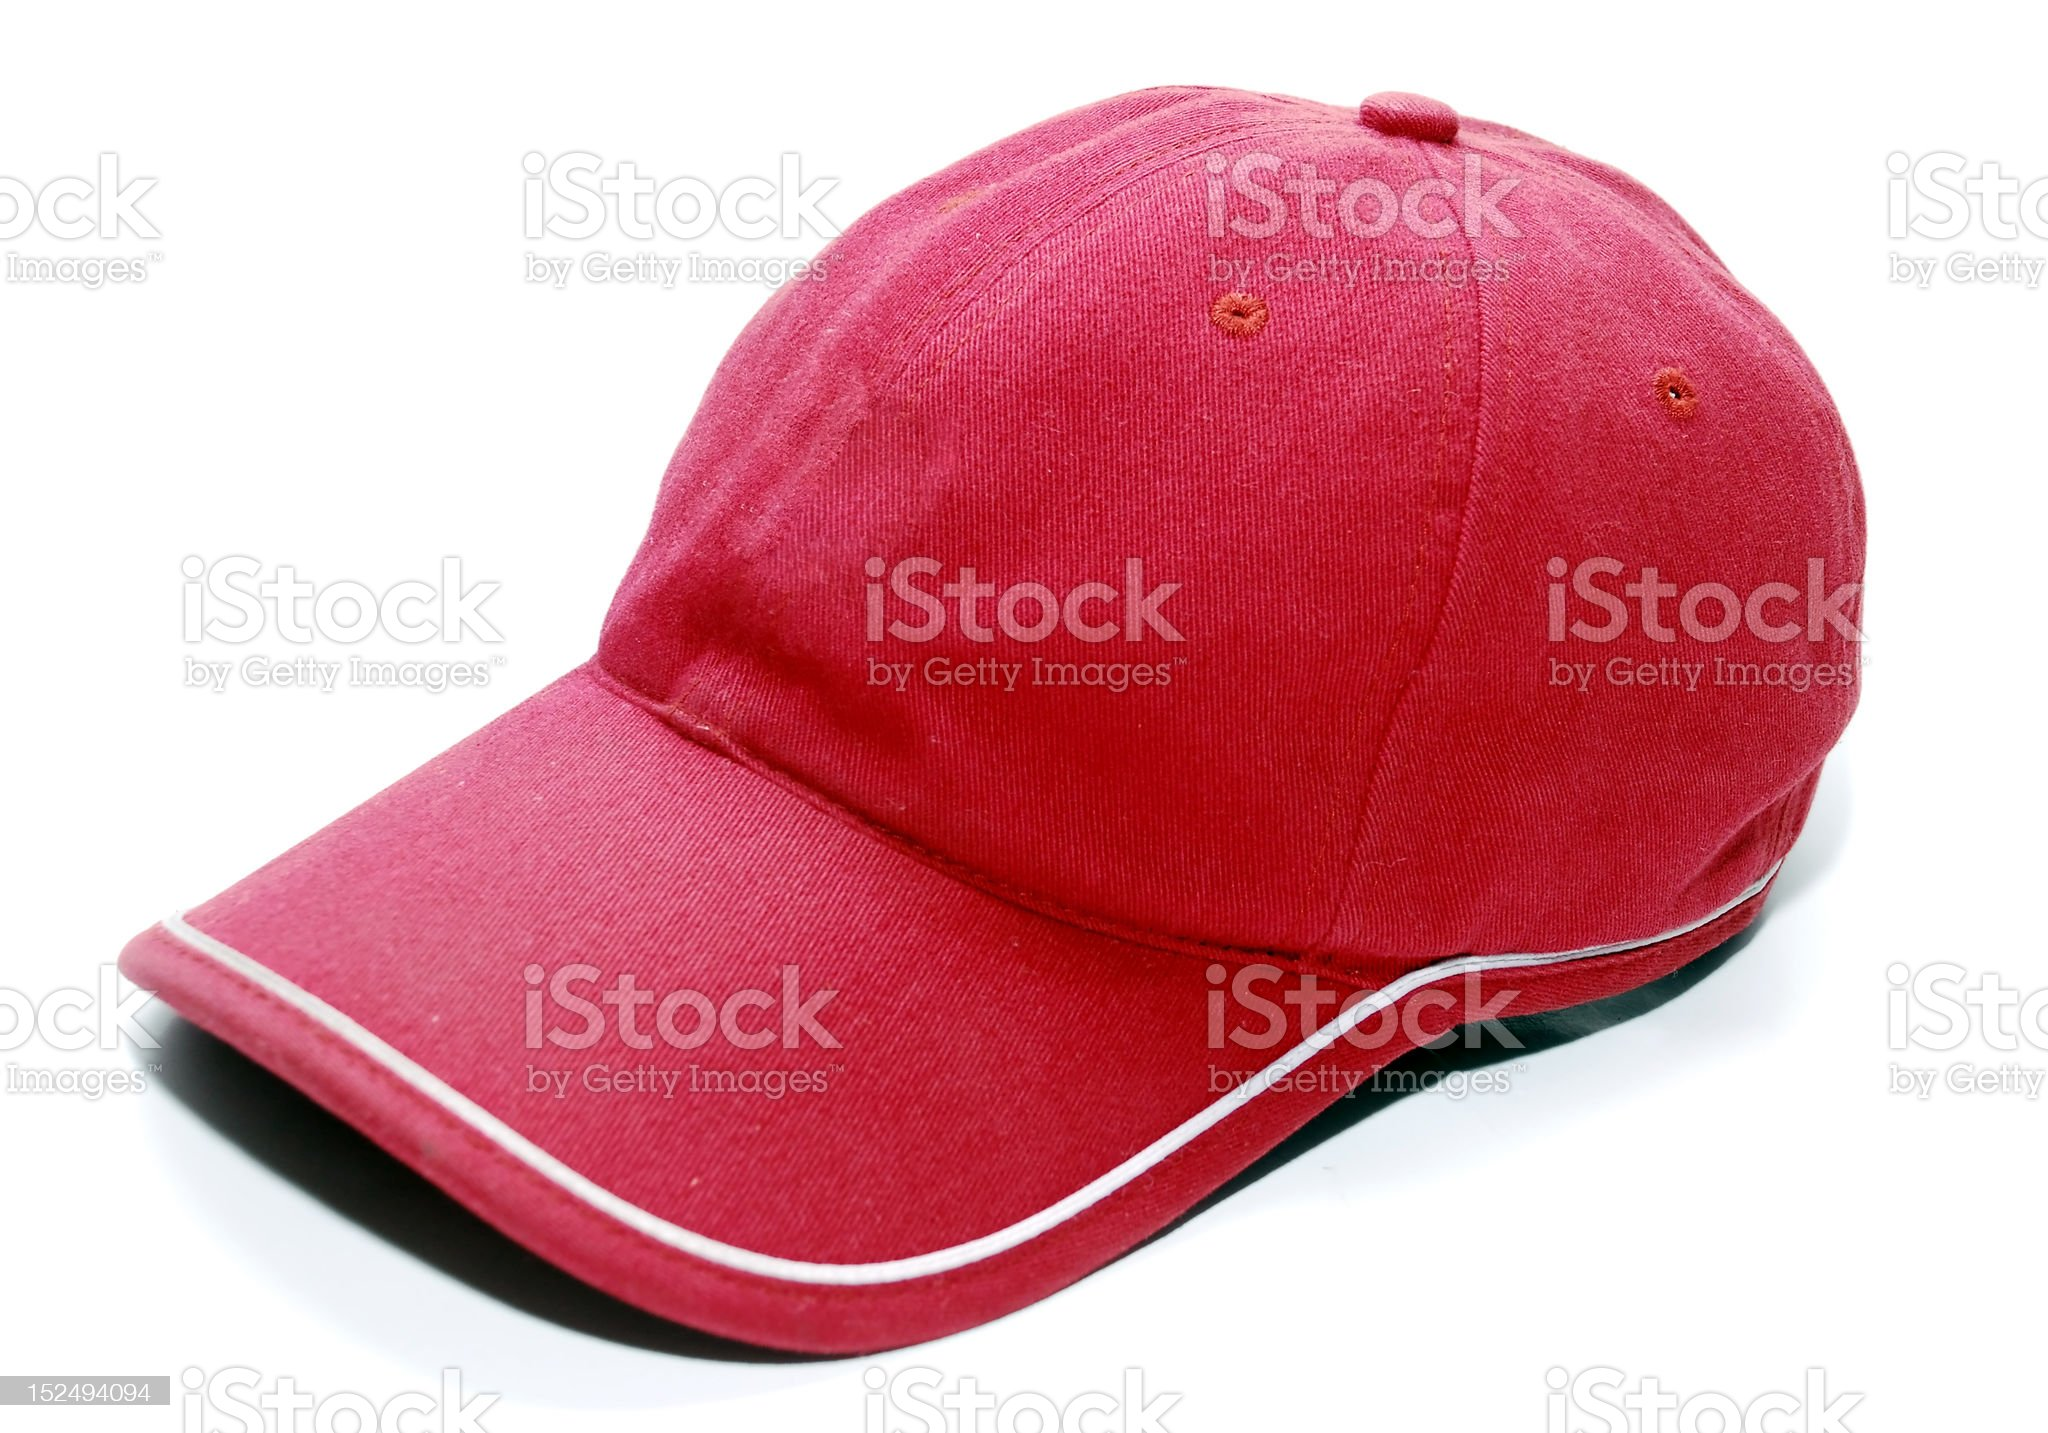 Red Baseball Cap royalty-free stock photo